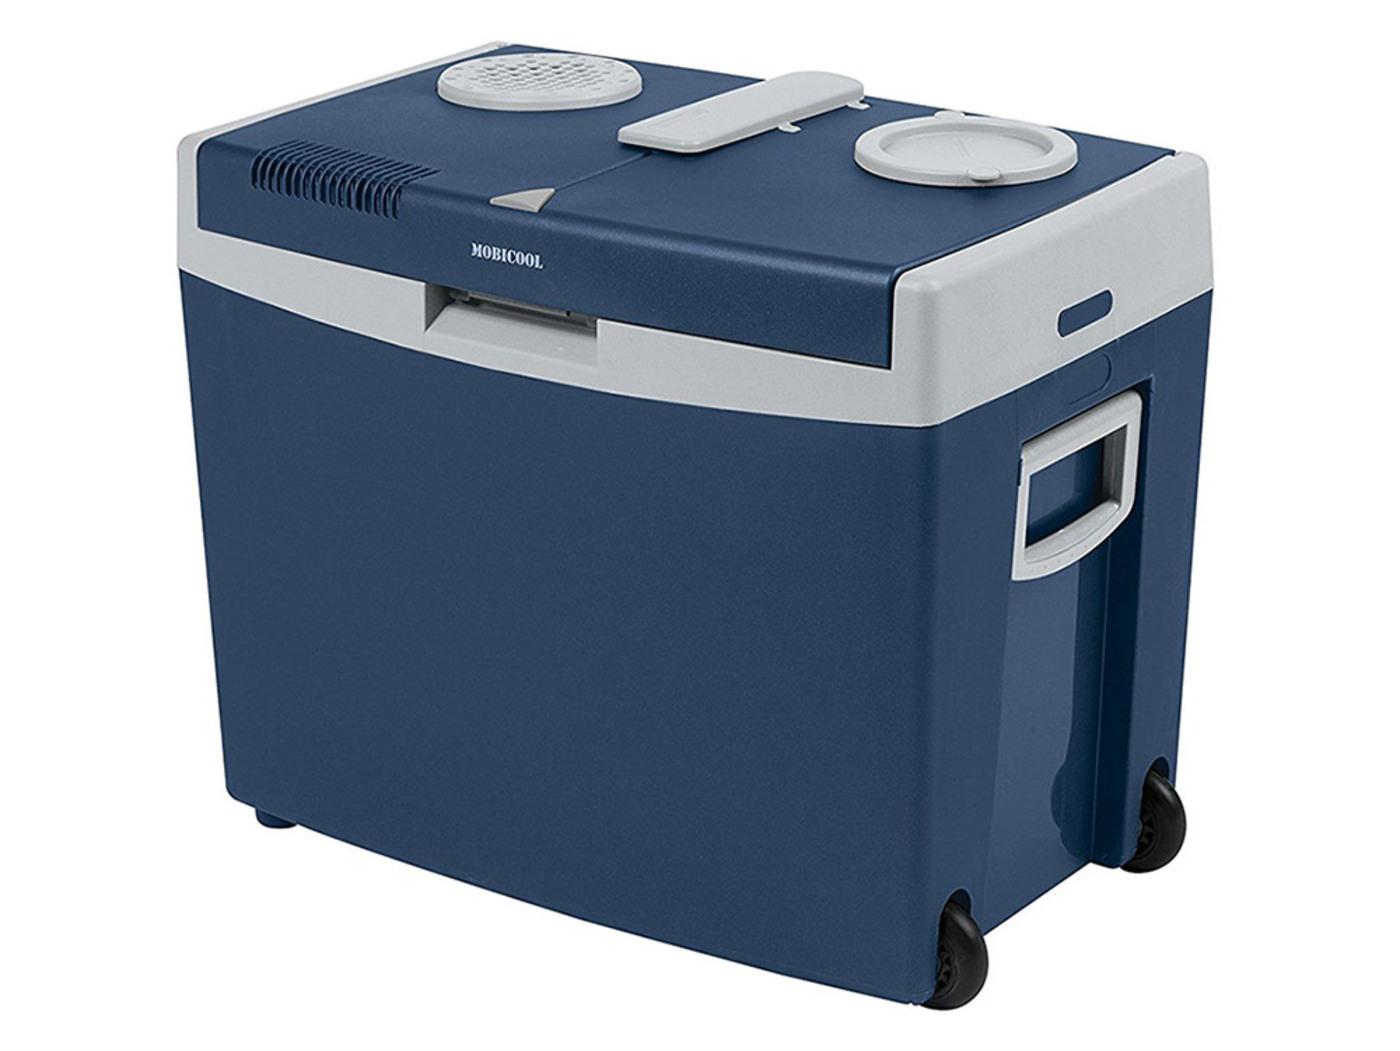 mobicool g35 12v 230v thermoelectric cool box homestead. Black Bedroom Furniture Sets. Home Design Ideas